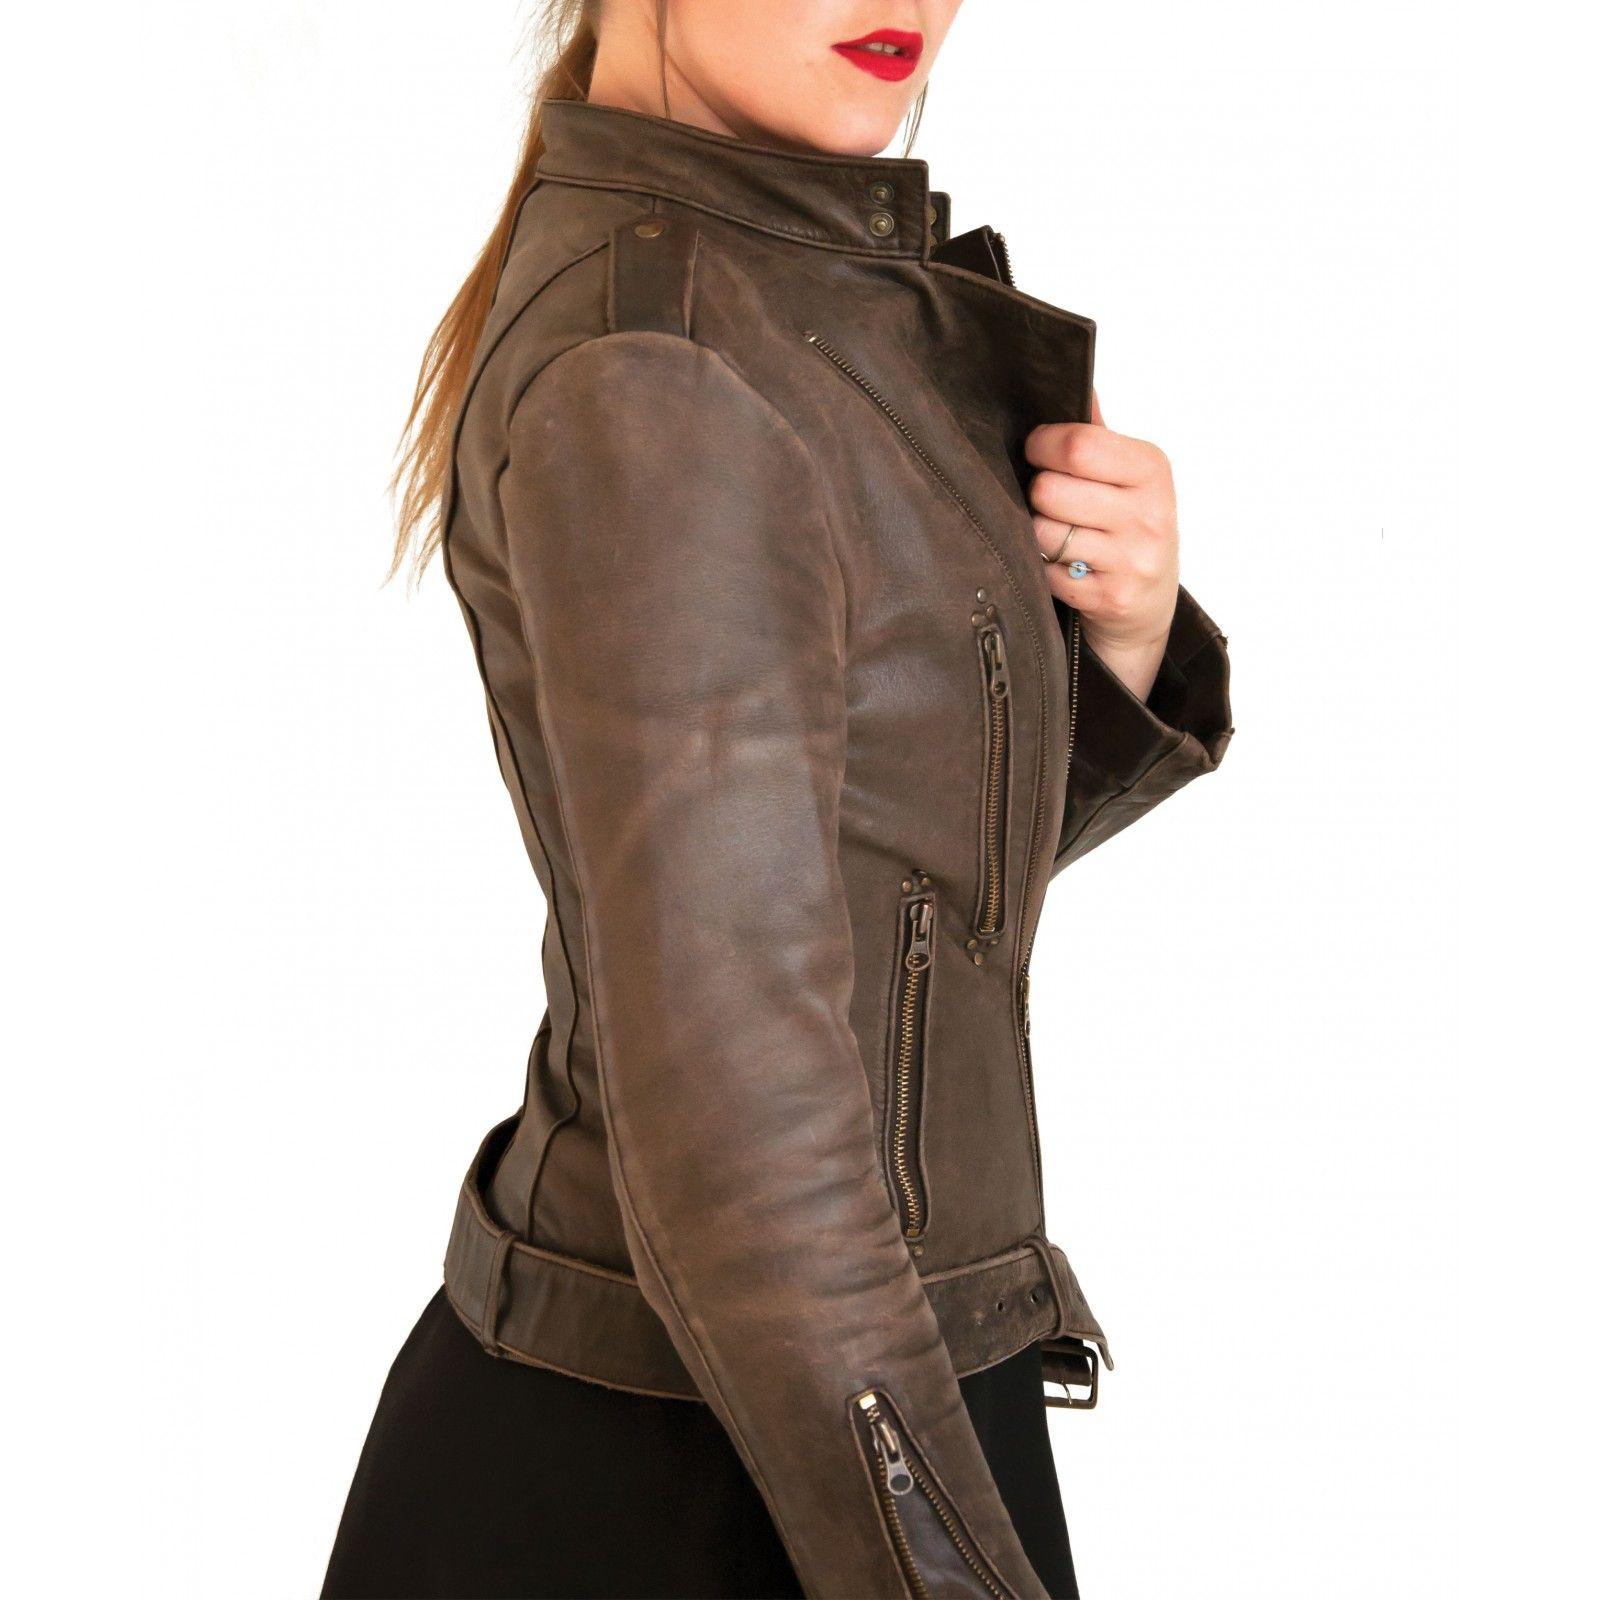 4208a1e65e49 Moss Fashion Vintage, Outerwear Jackets, Leather Jacket, Studded Leather  Jacket, Vintage Fashion